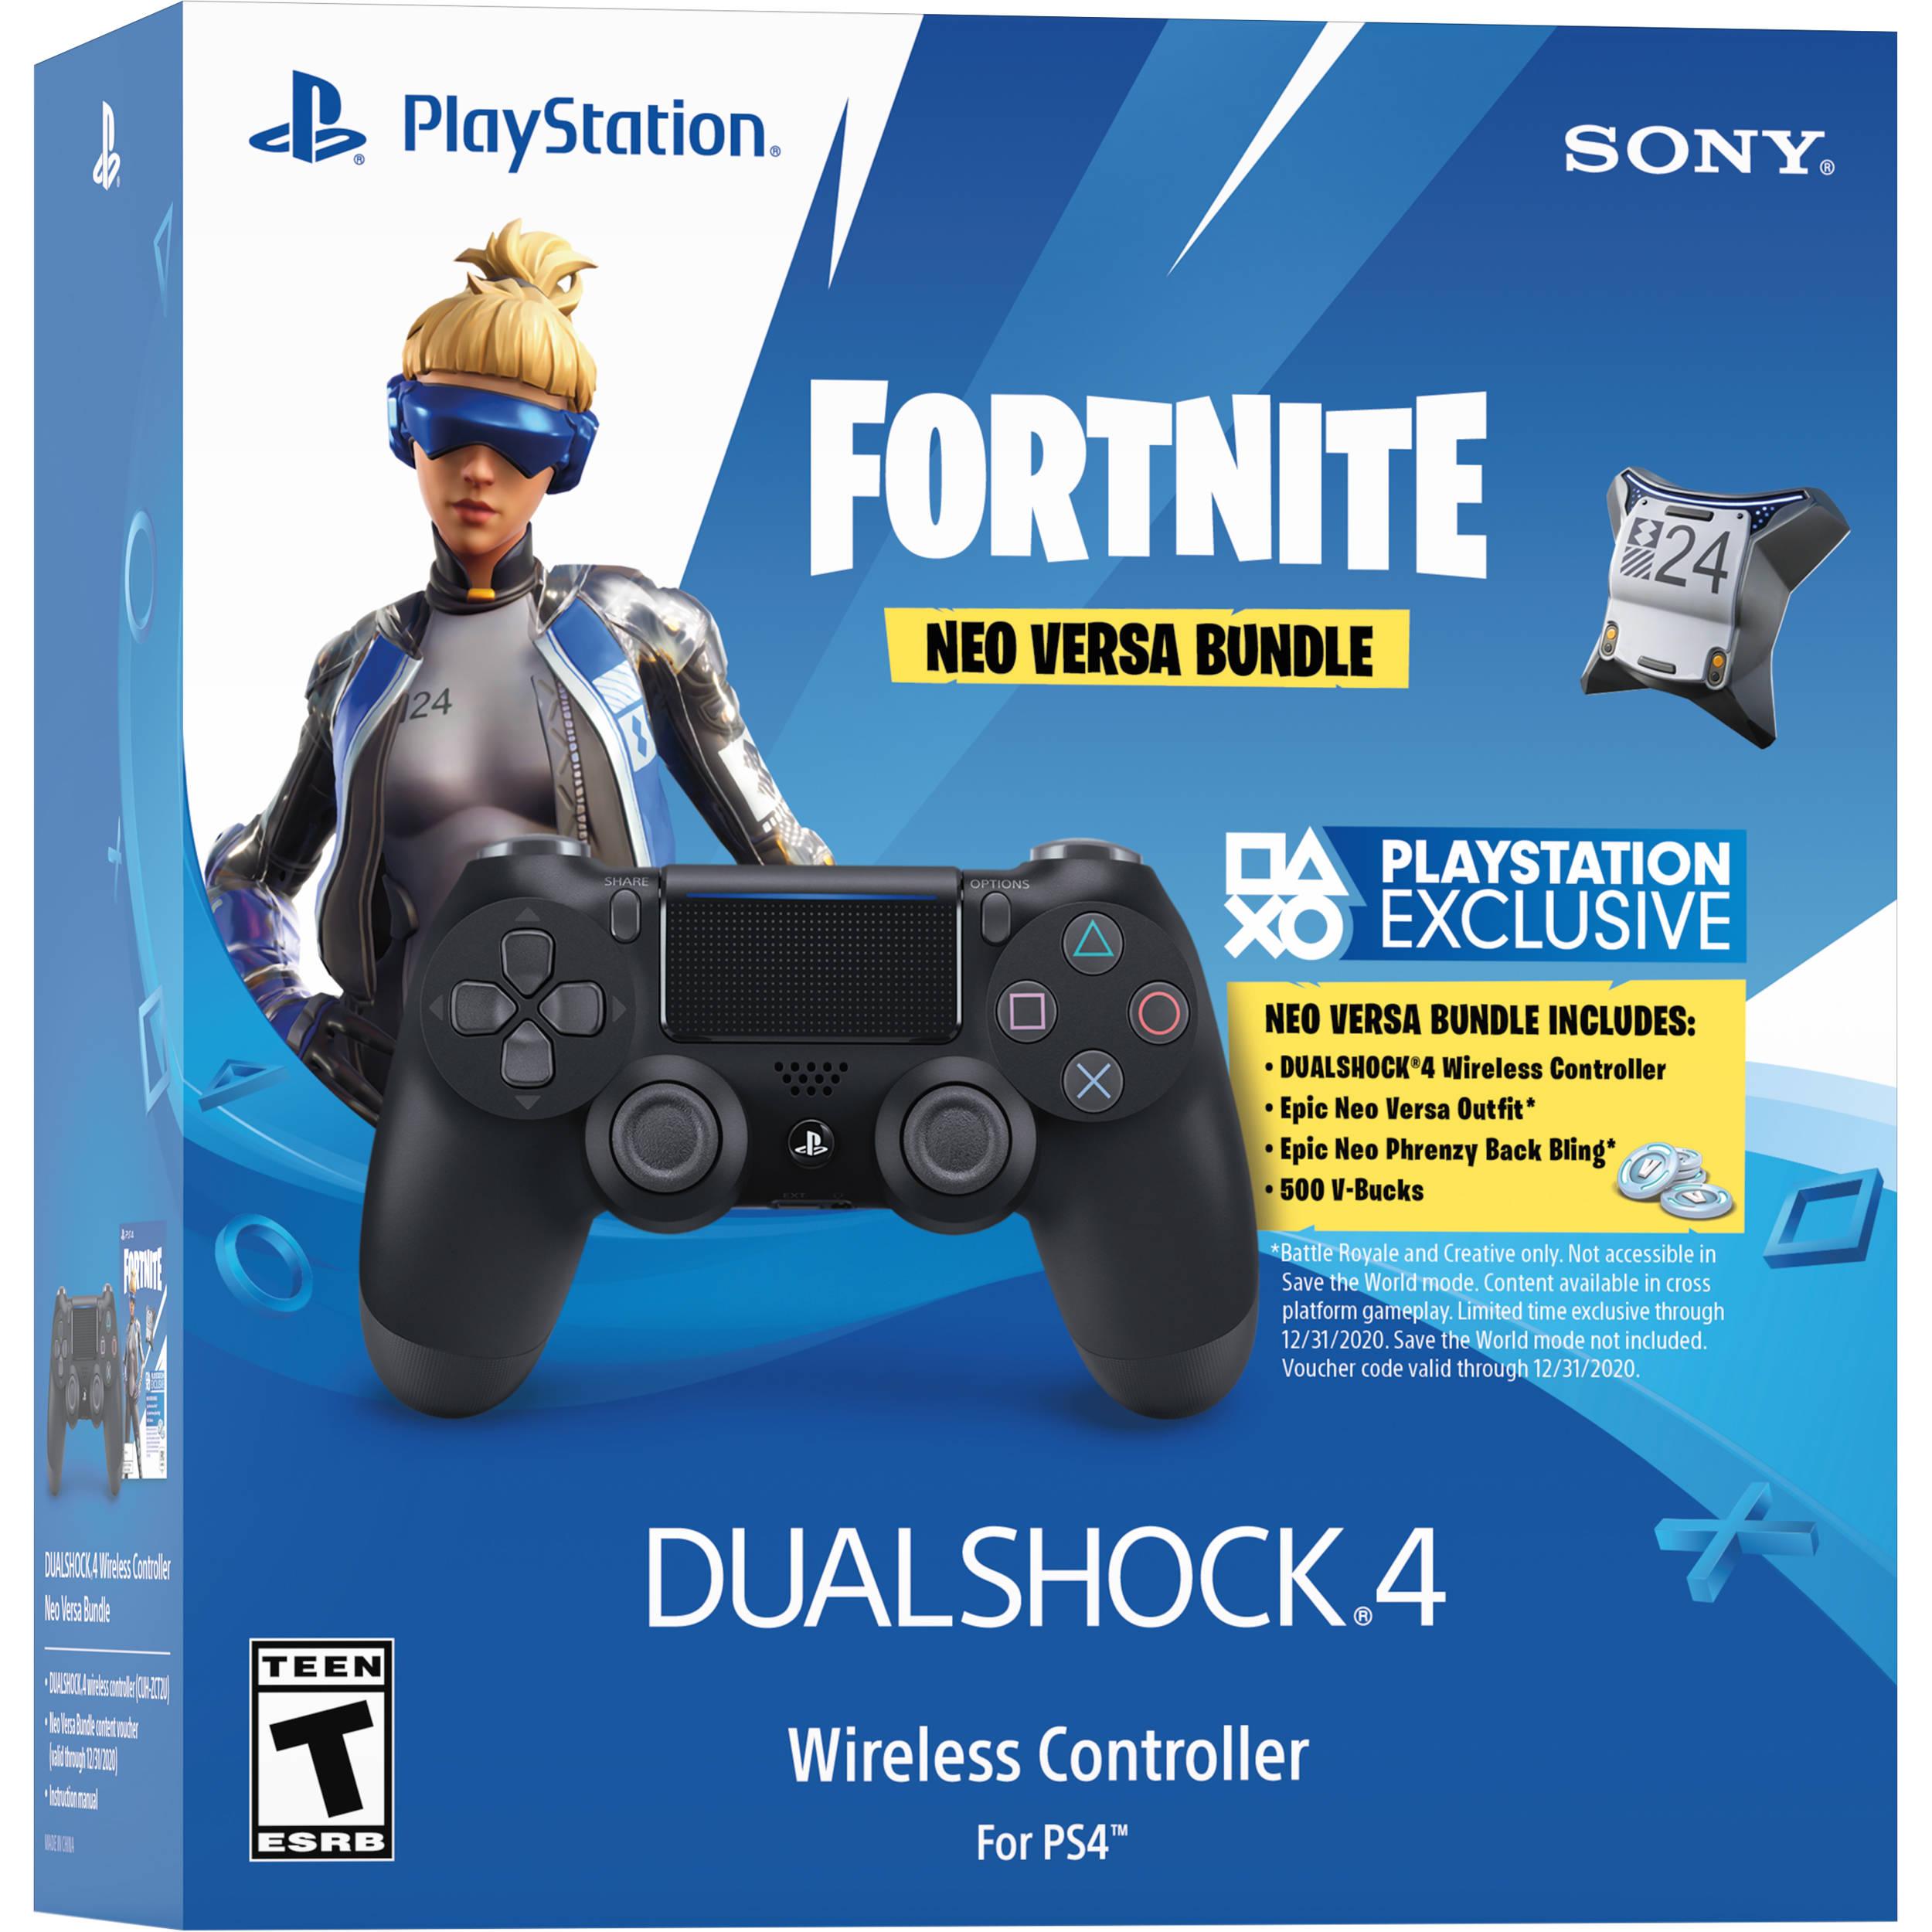 Sony Fortnite Neo Versa Dualshock 4 Wireless Controller 3004661